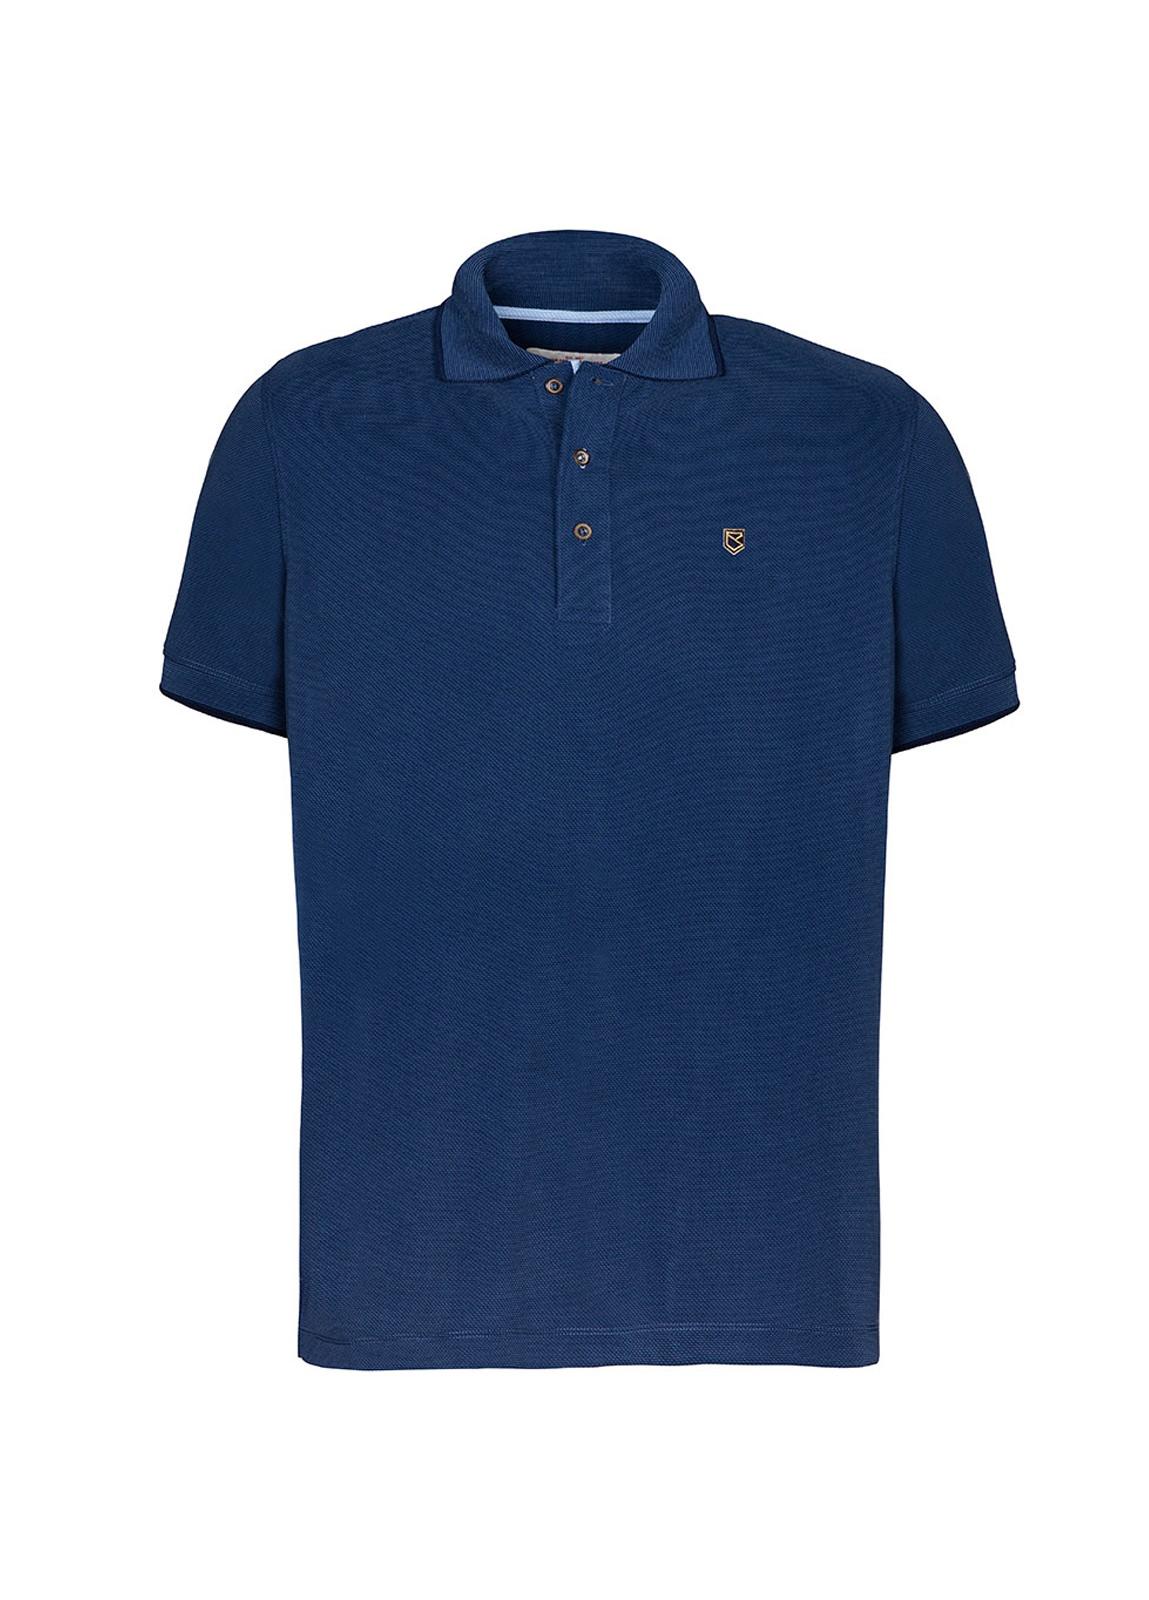 Glengarrif Polo Shirt - Navy